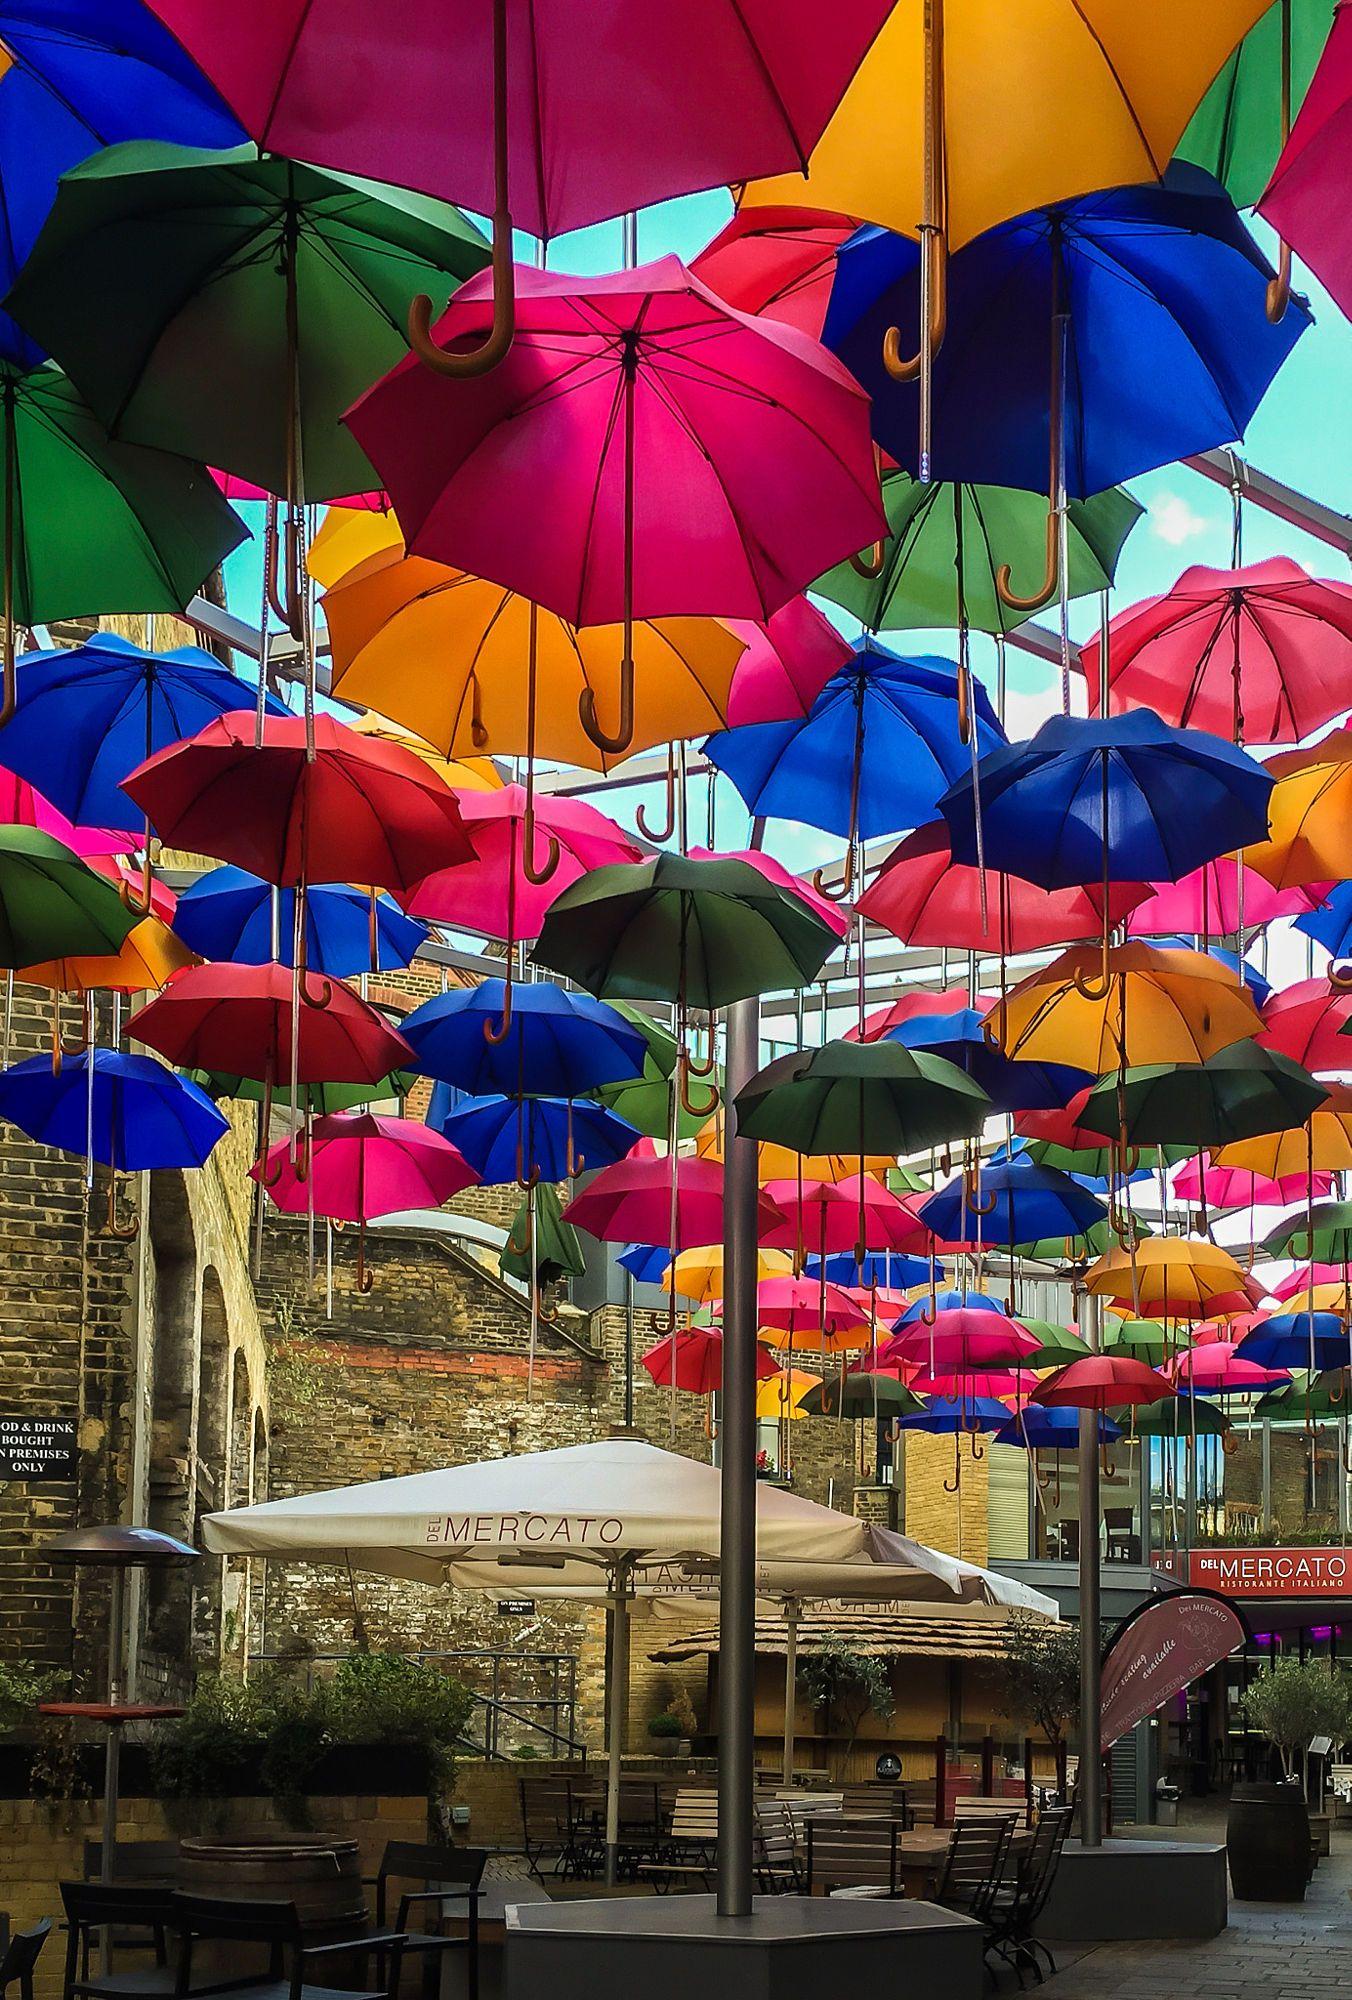 Cafe of umbrellas, London, England